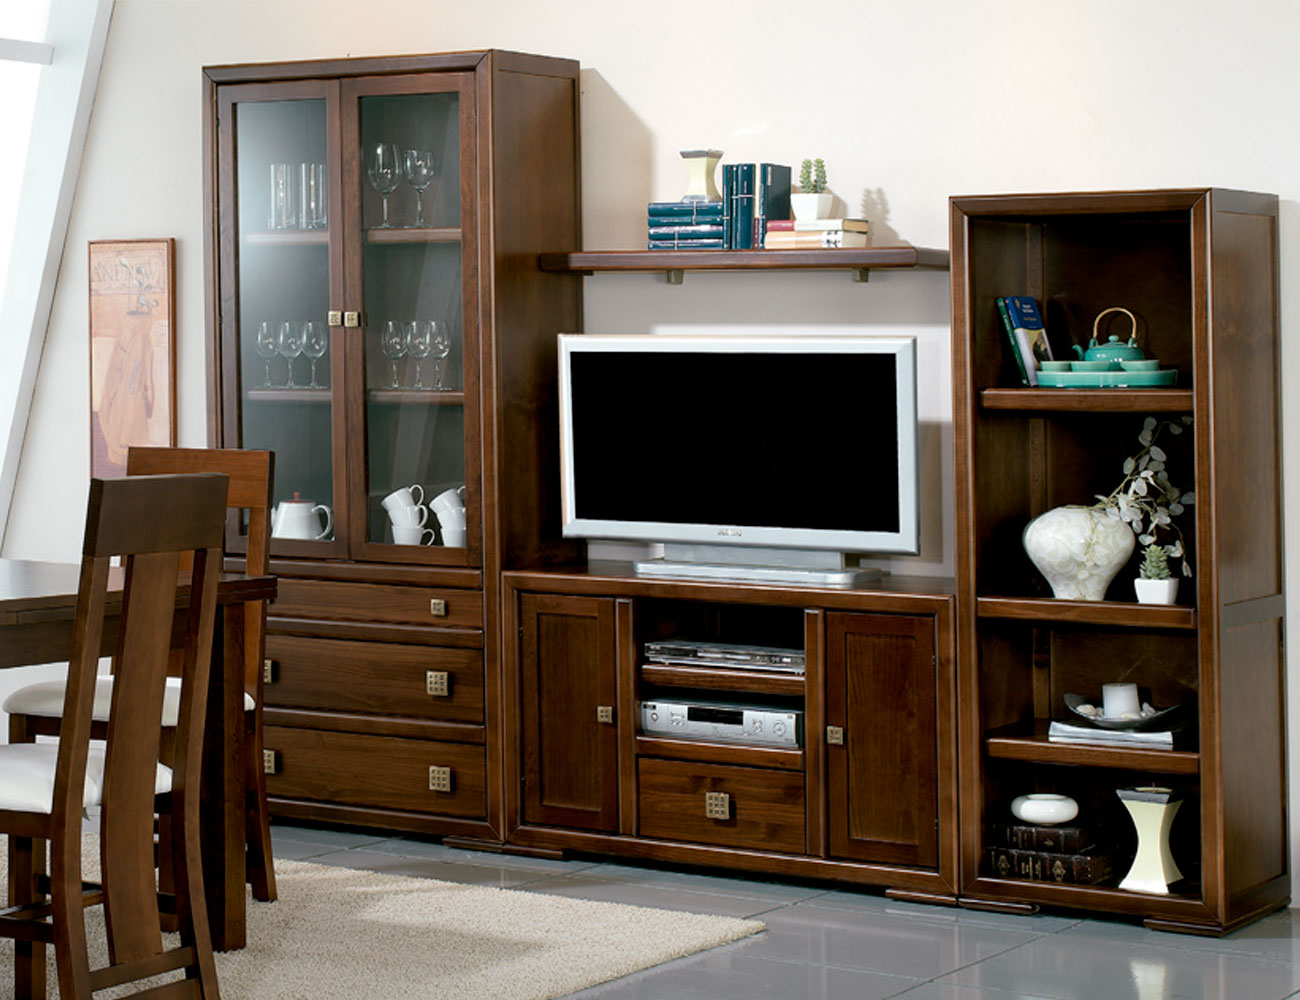 Composicion12 mueble salon comedor1